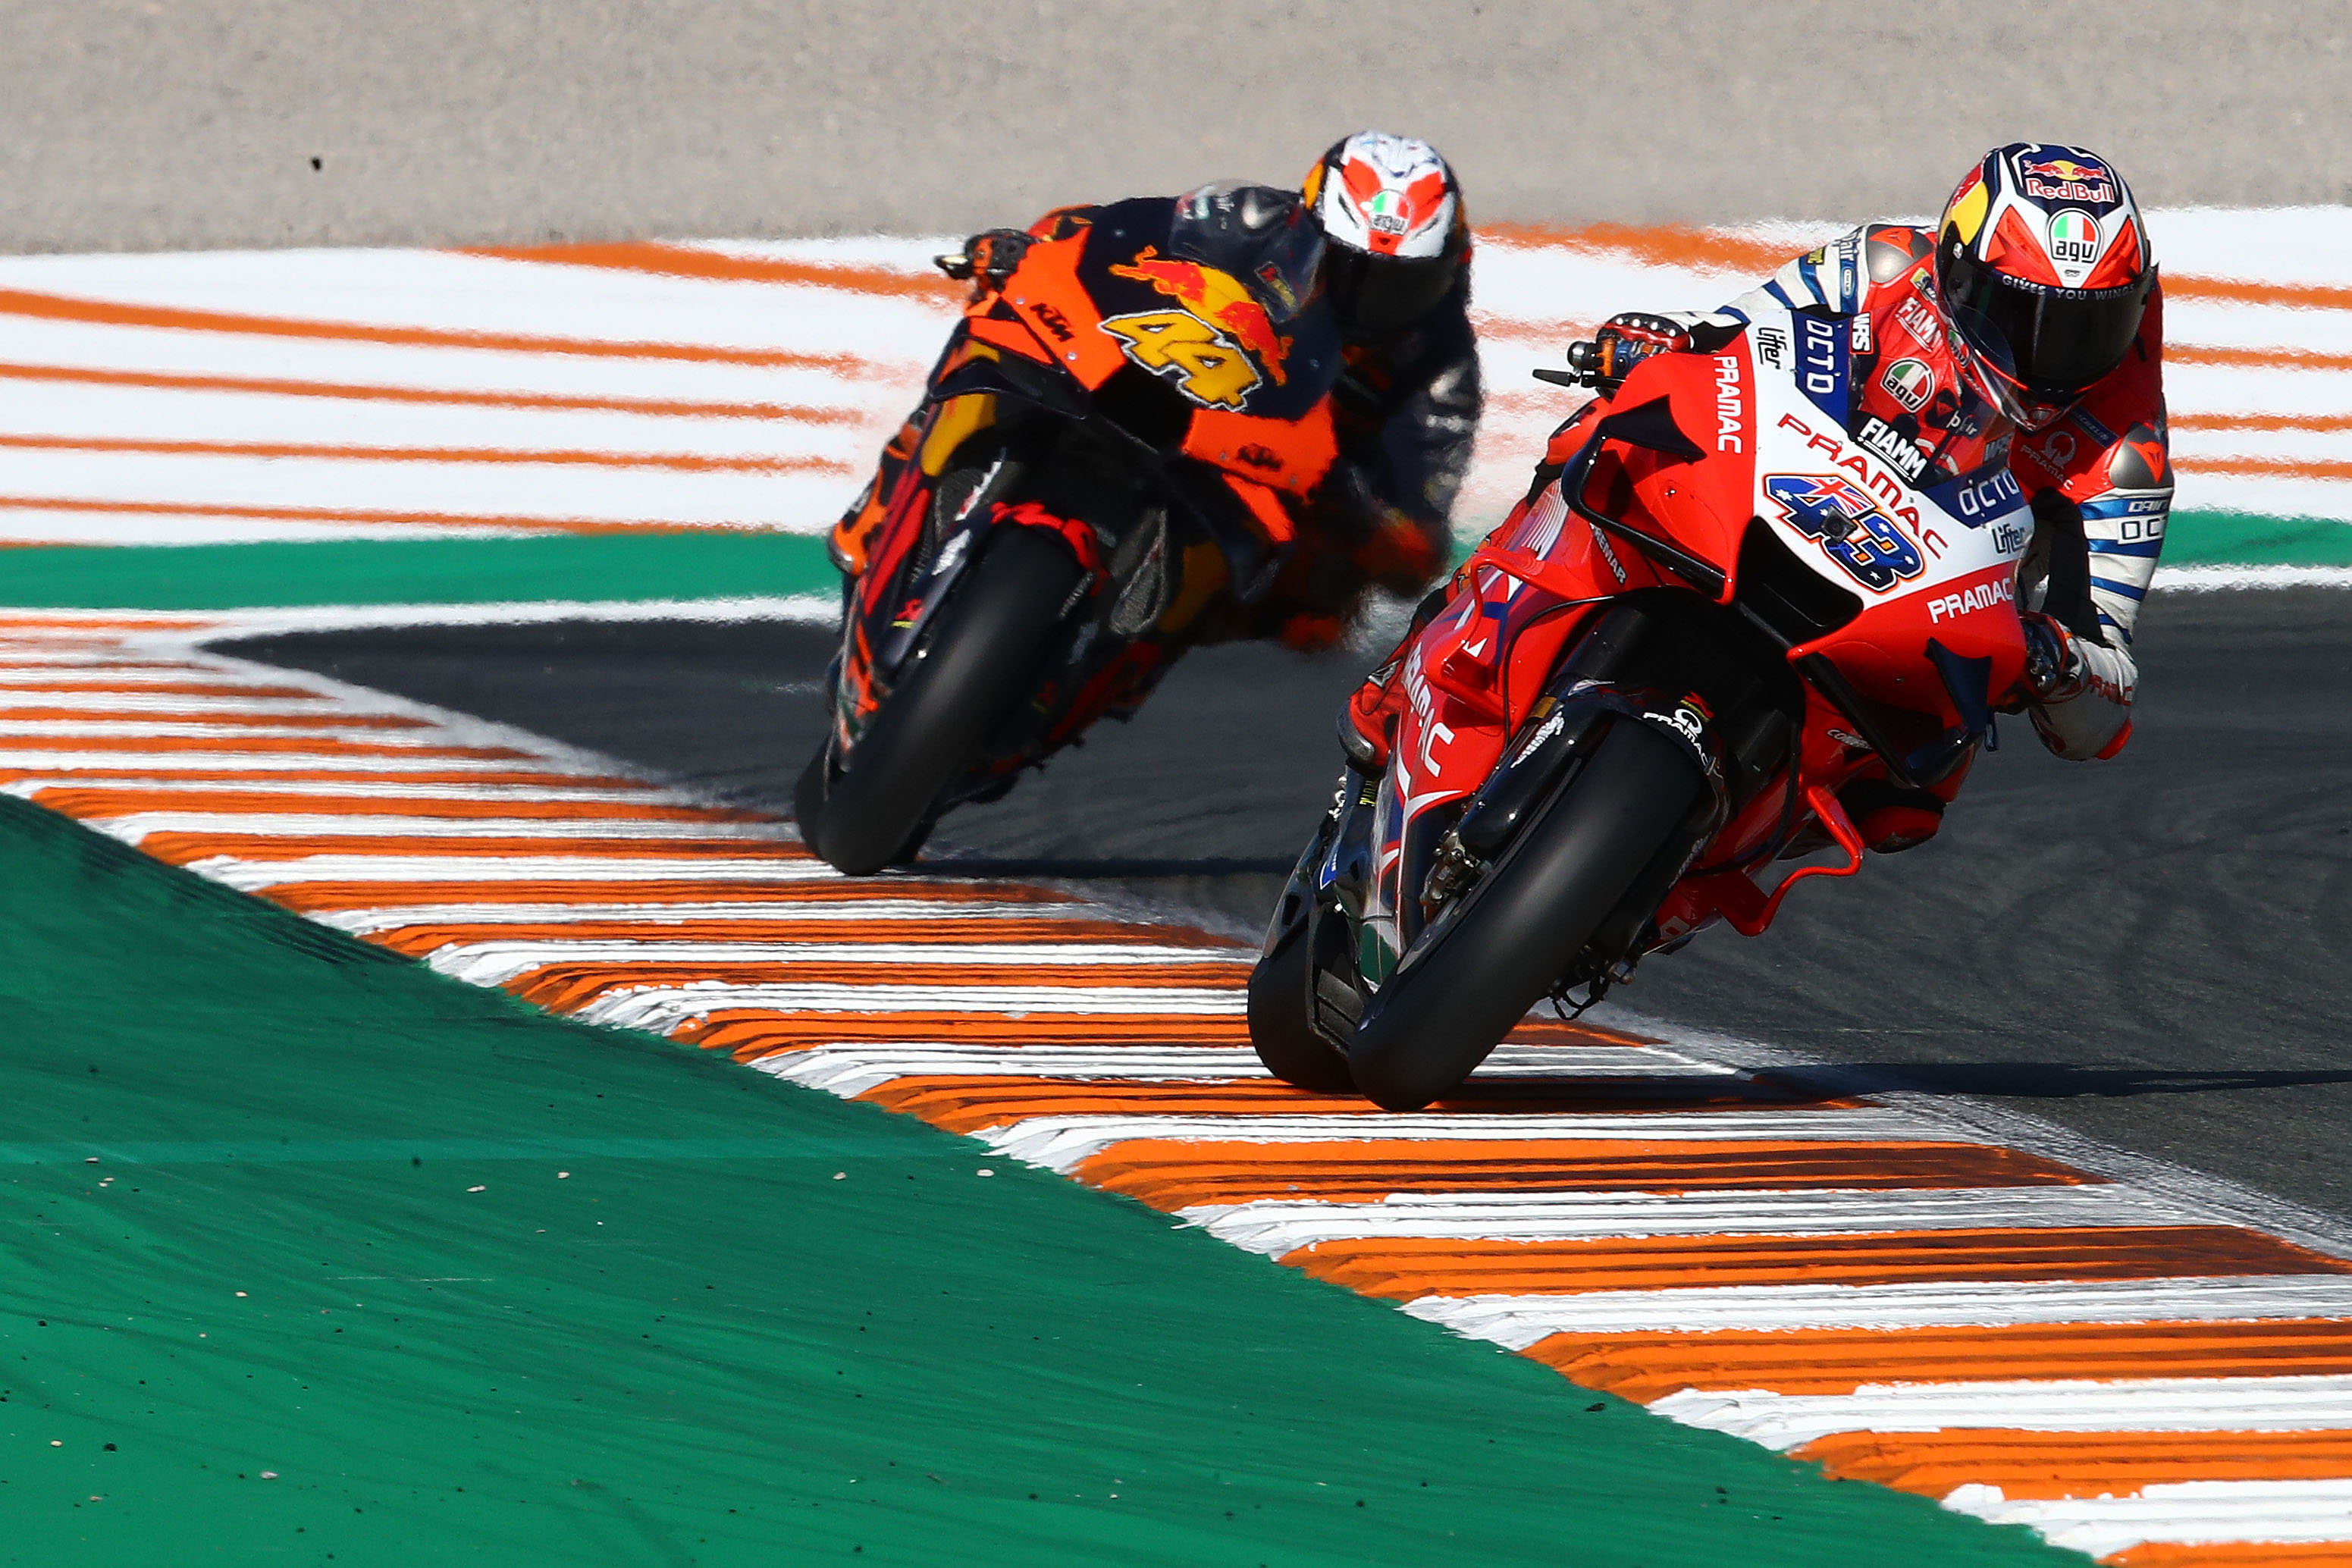 Jack Miller Pramac Ducati Pol Espargaro KTM Valencia MotoGP 2020